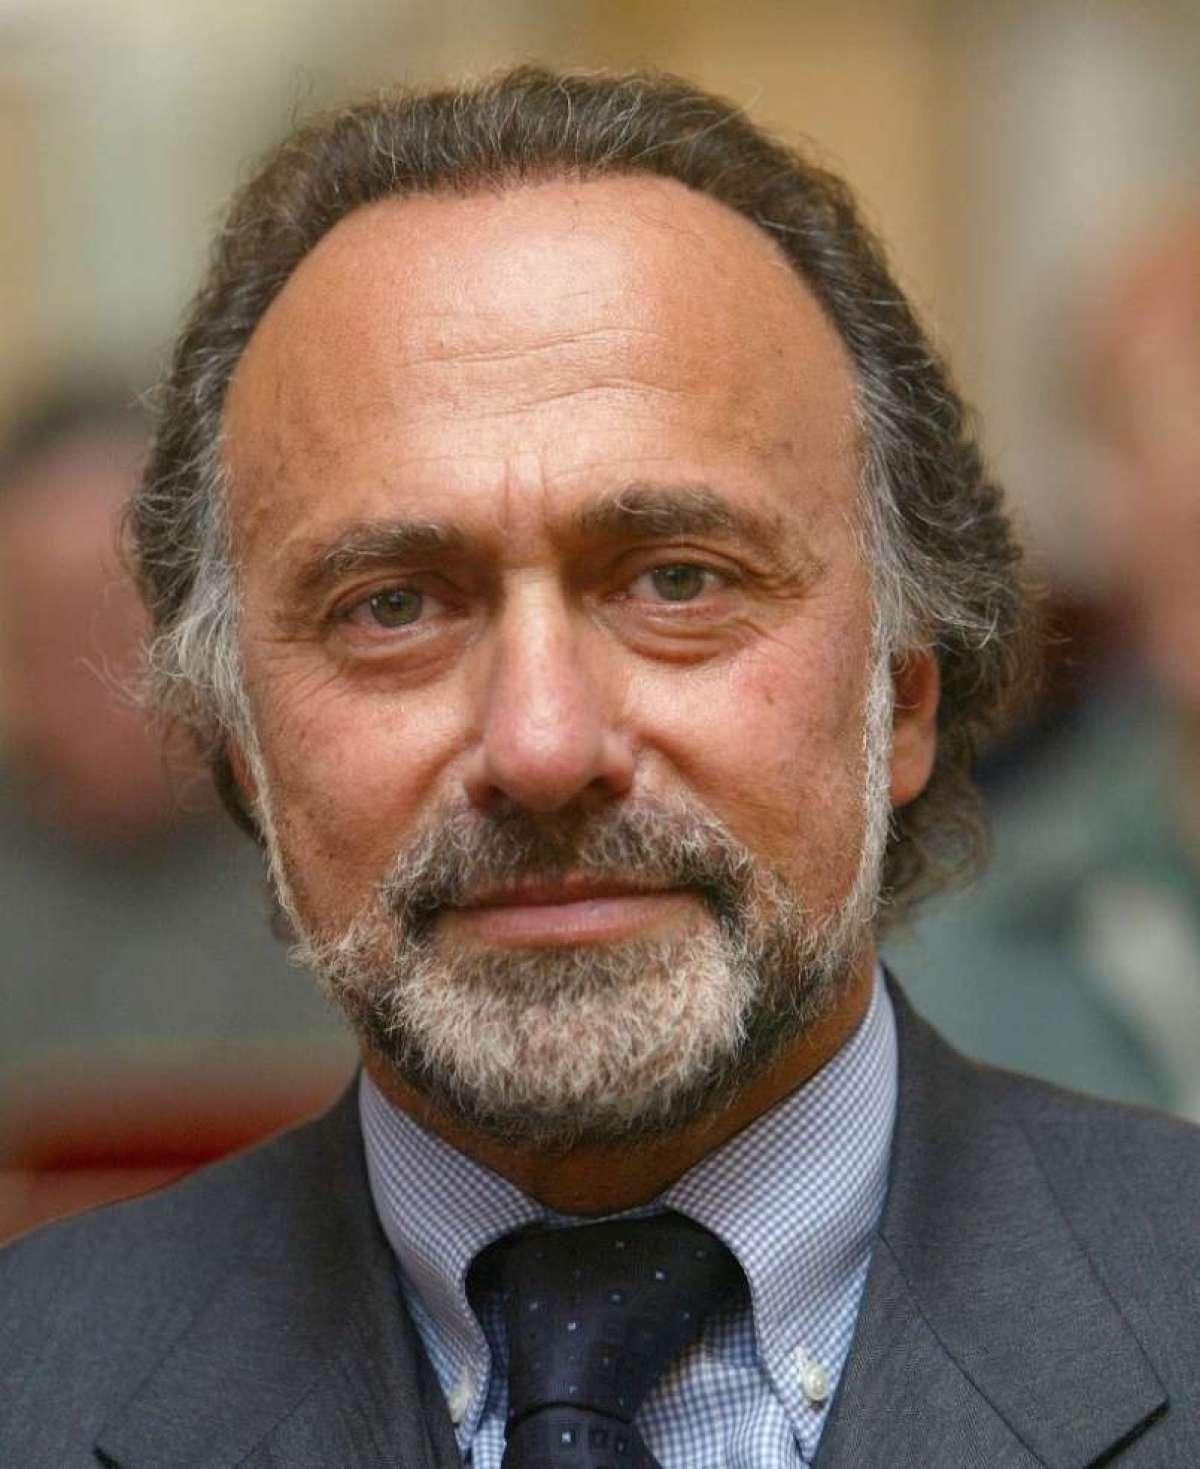 V helikopterski nesreči umrl francoski milijarder Olivier Dassault.